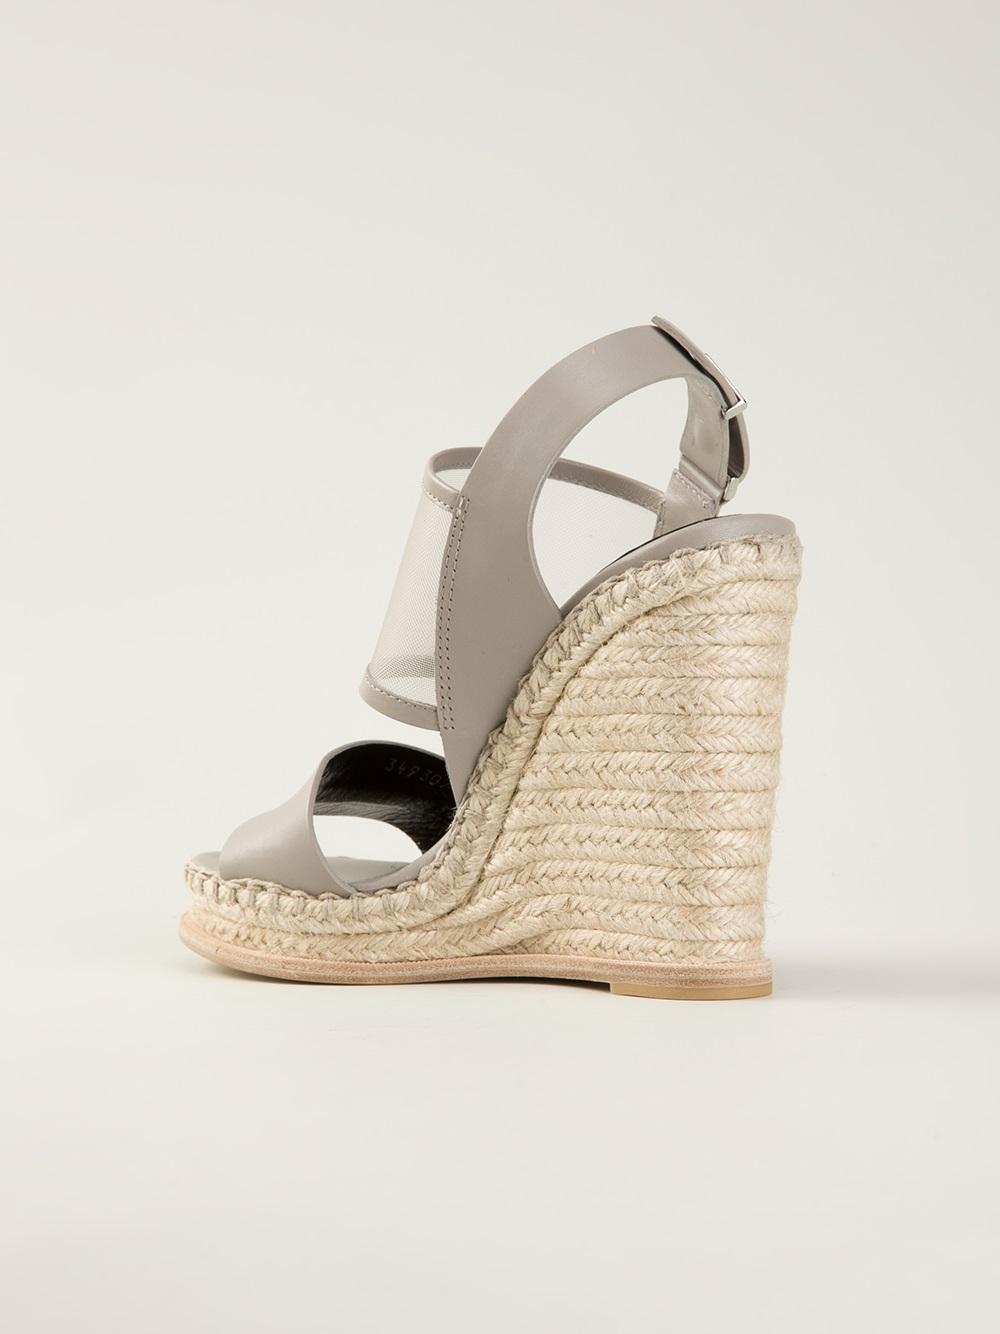 Balenciaga Wedge Sandals In Gray Lyst